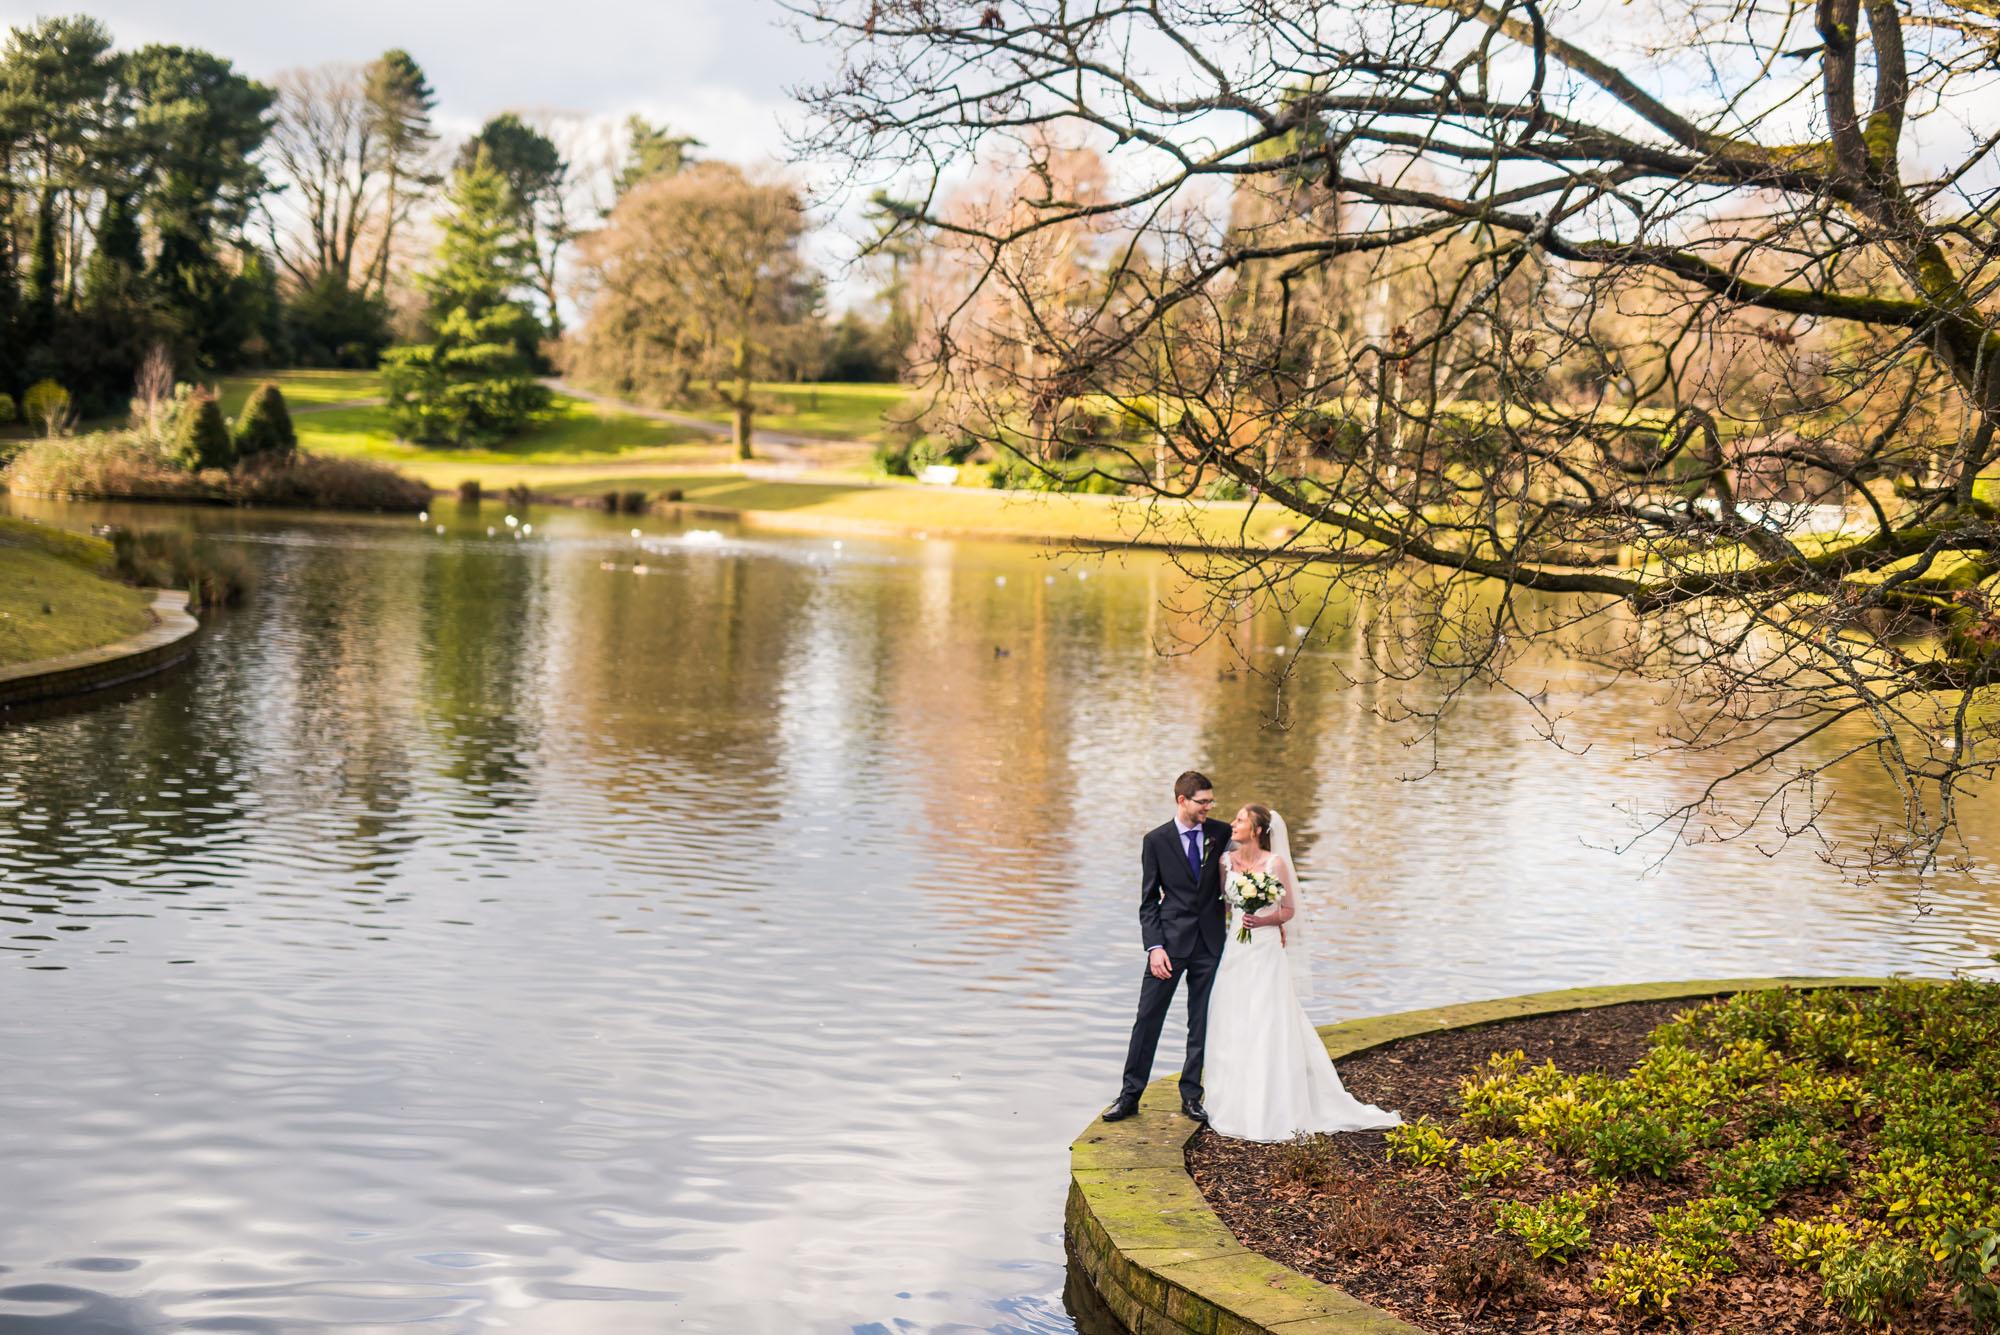 Rachel and Nicholas - WEDDING HIGHLIGHTS